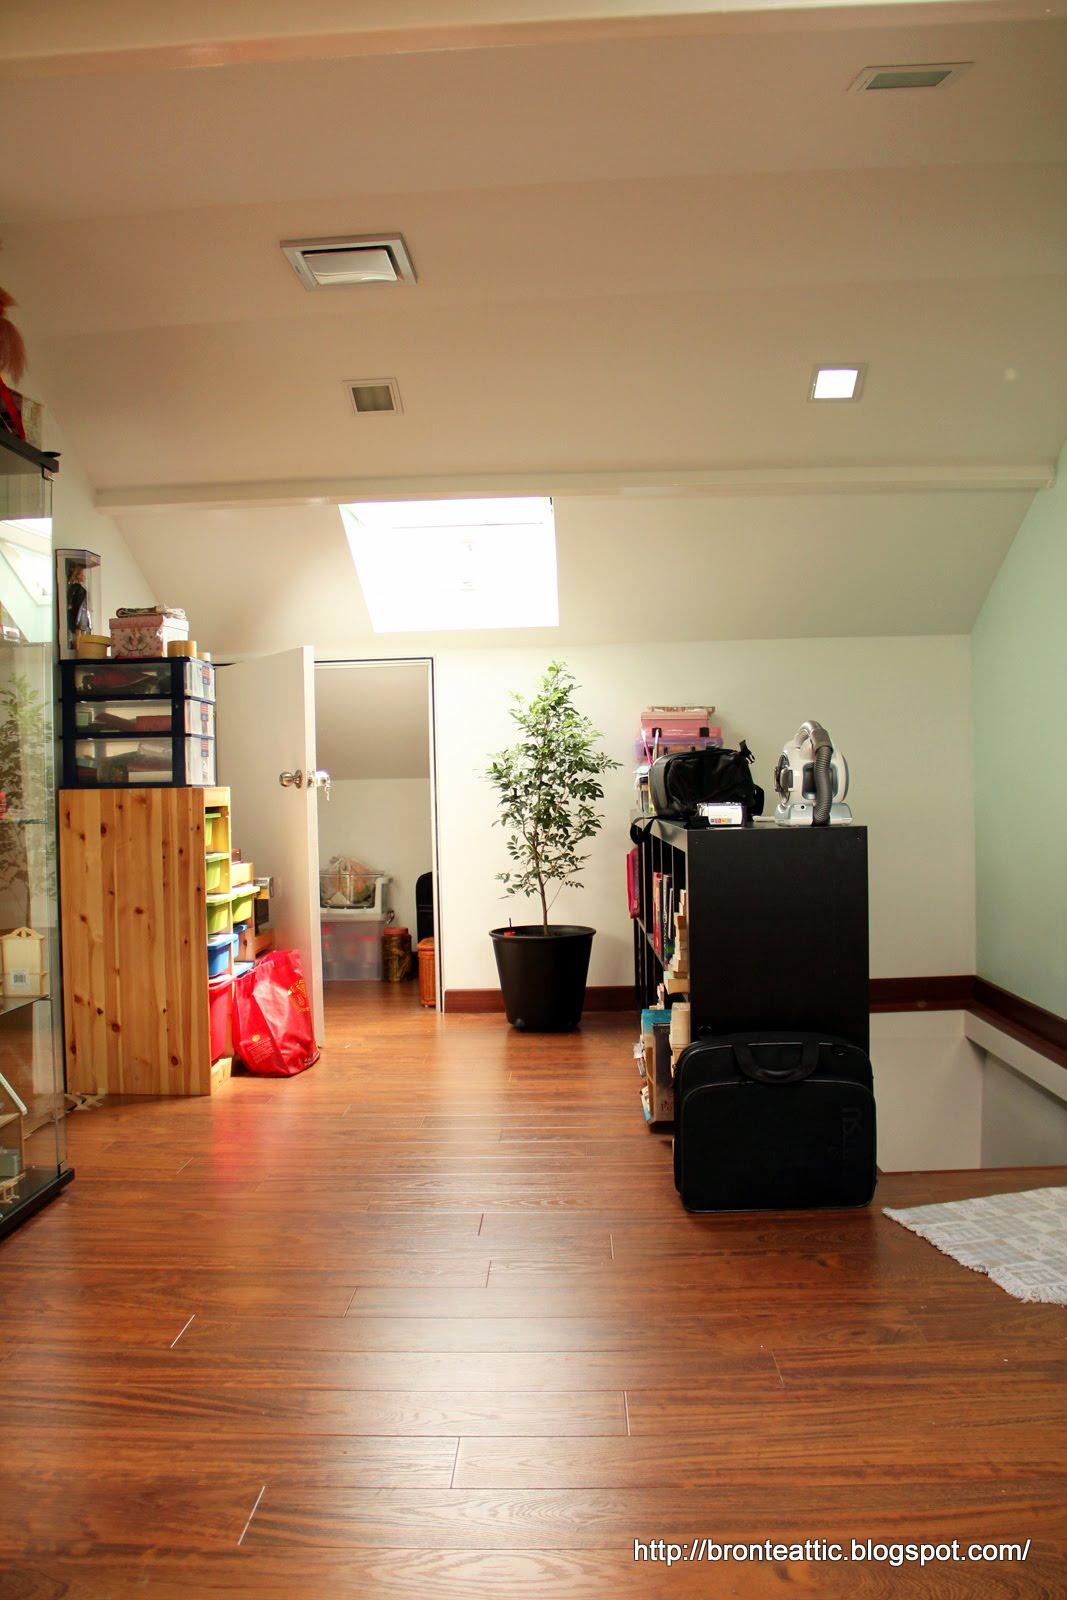 Attic Conversion New Study Room And Bedroom In Attic